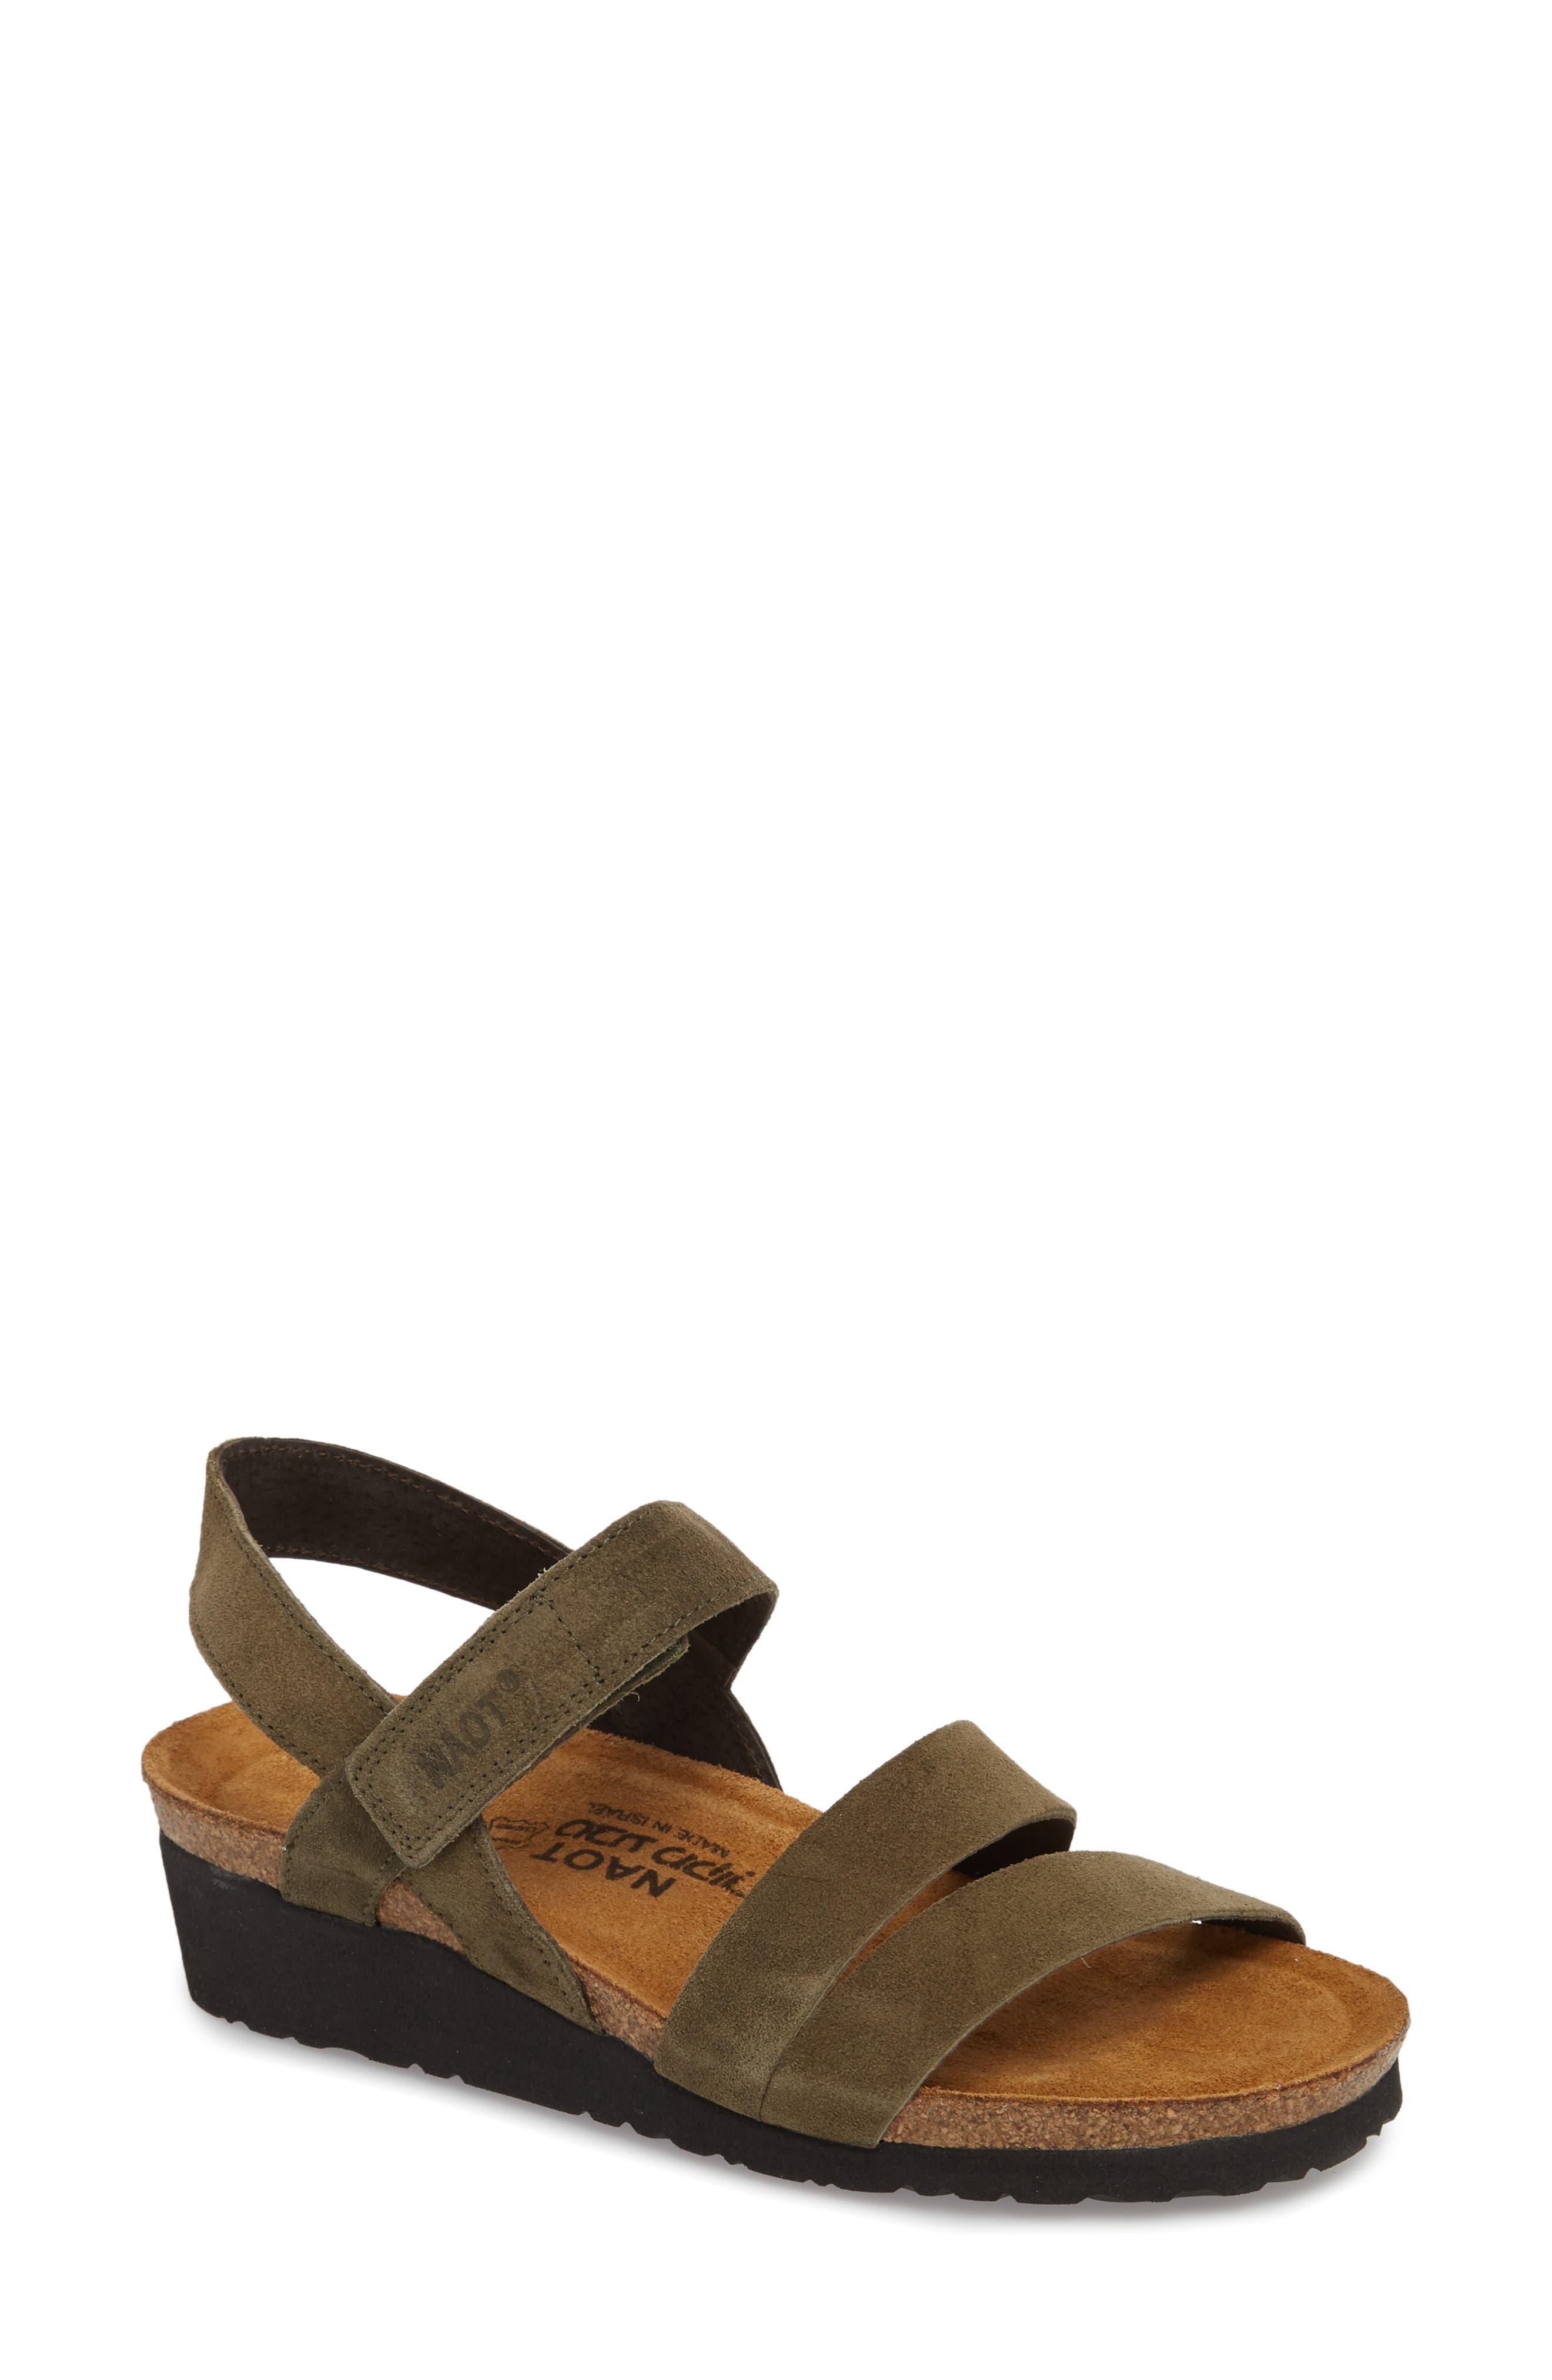 'Kayla' Sandal, Main, color, OILY OLIVE SUEDE